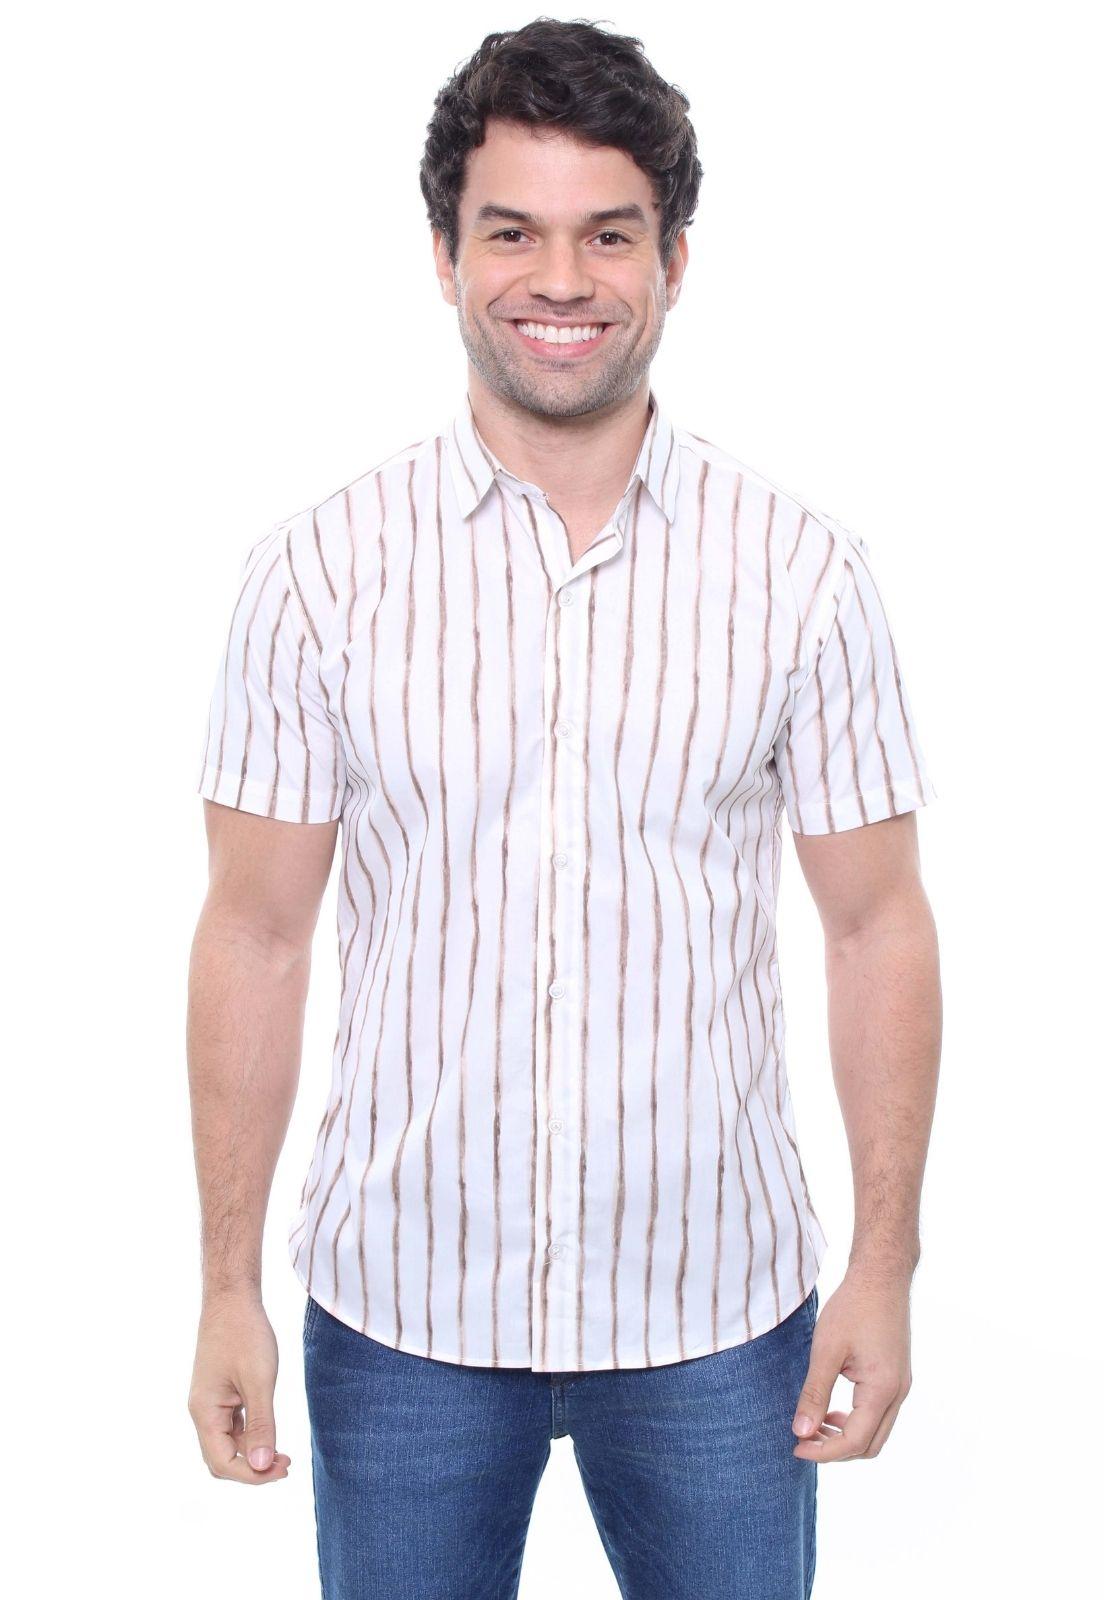 Camisa Estampada Masculina Manga Curta Crocker -  47830  - CROCKER JEANS